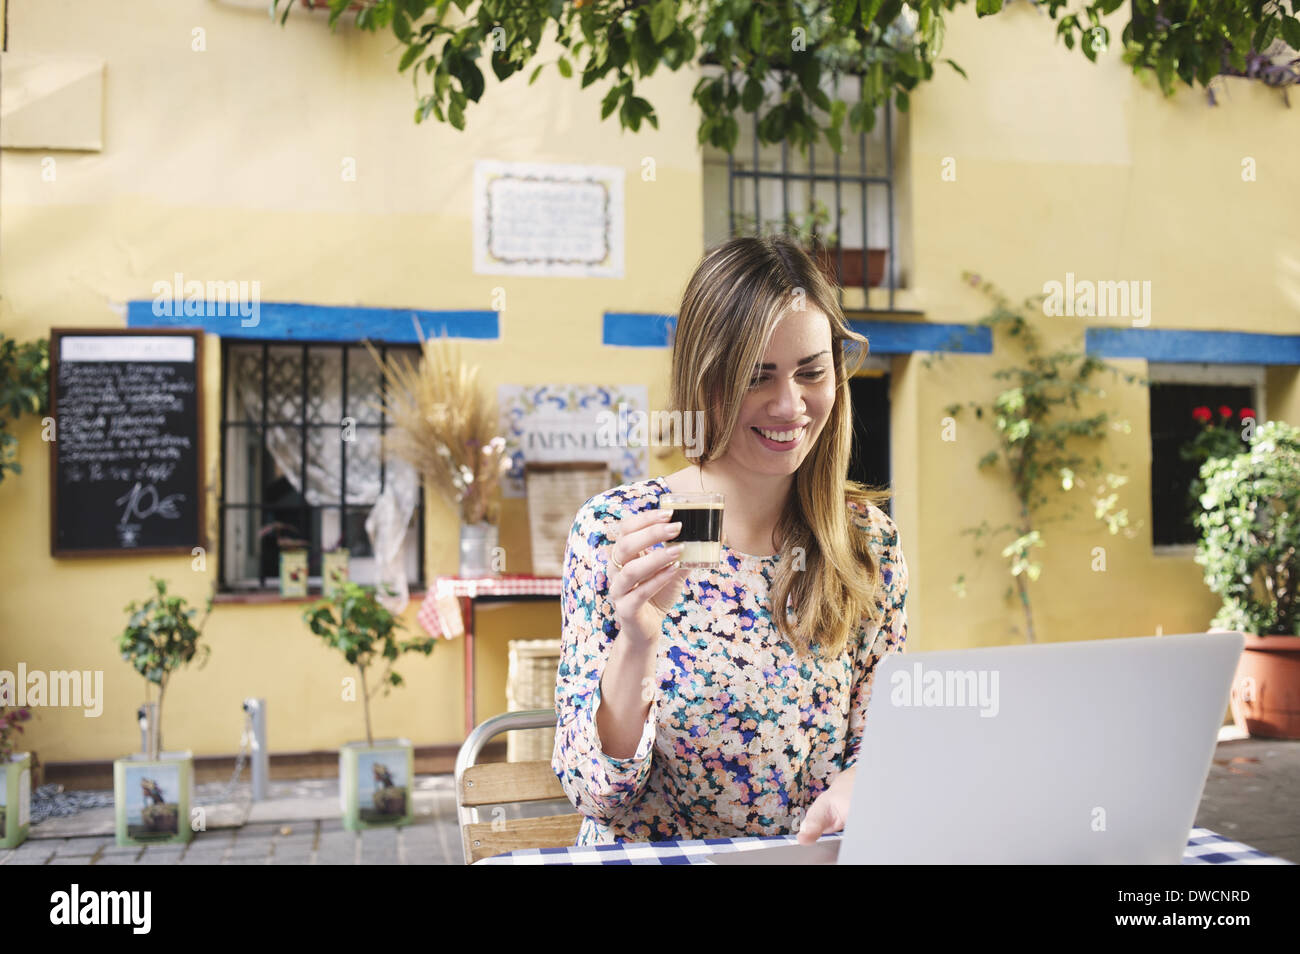 Young female tourist enjoying a break at sidewalk cafe, Valencia, Spain - Stock Image